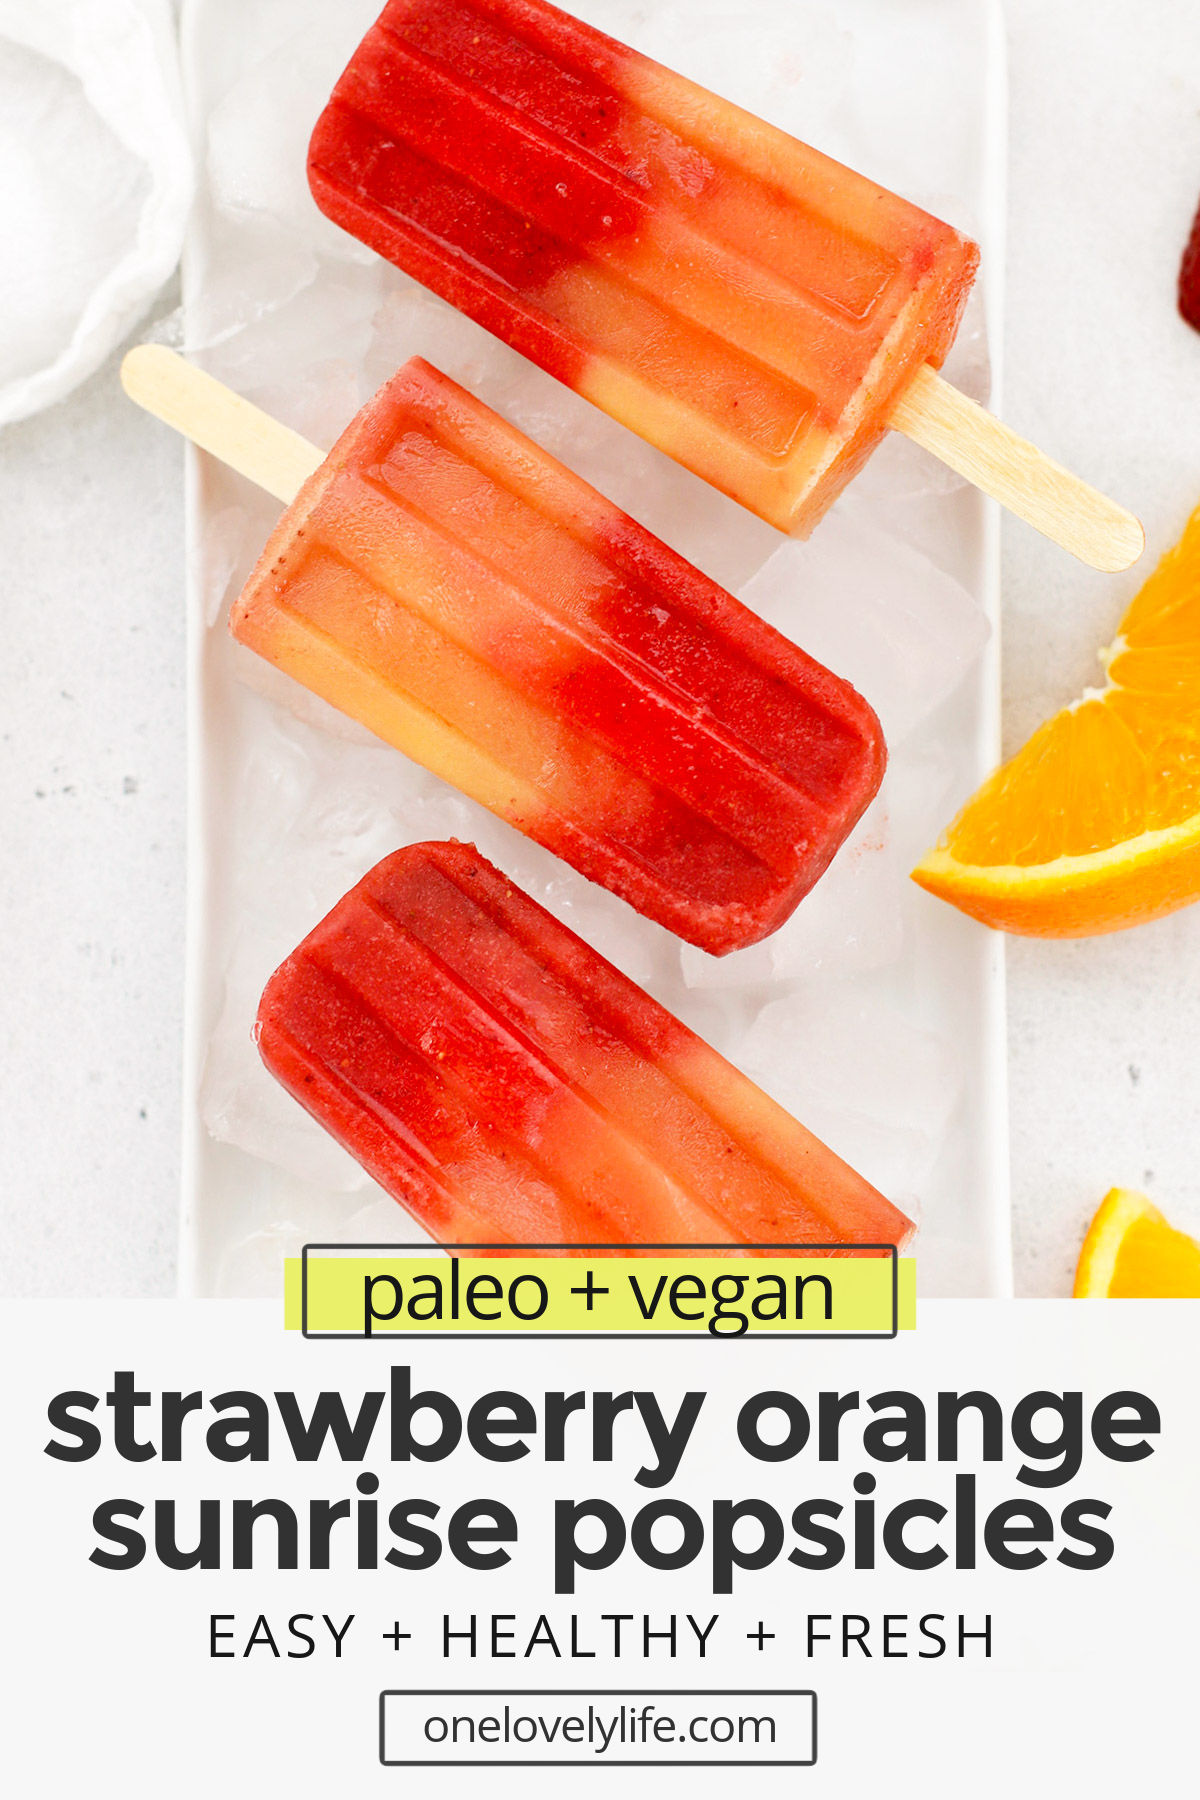 Strawberry Orange Sunrise Popsicles - These pretty orange strawberry popsicles are naturally sweetened & perfect for summer! (vegan & paleo) // Strawberry Orange Popsicles // Healthy Popsicles // Vegan Popsicles // Paleo Popsicles // Smoothie Popsicles #popsicles #icepops #summertreat #paleo #vegan #glutenfree